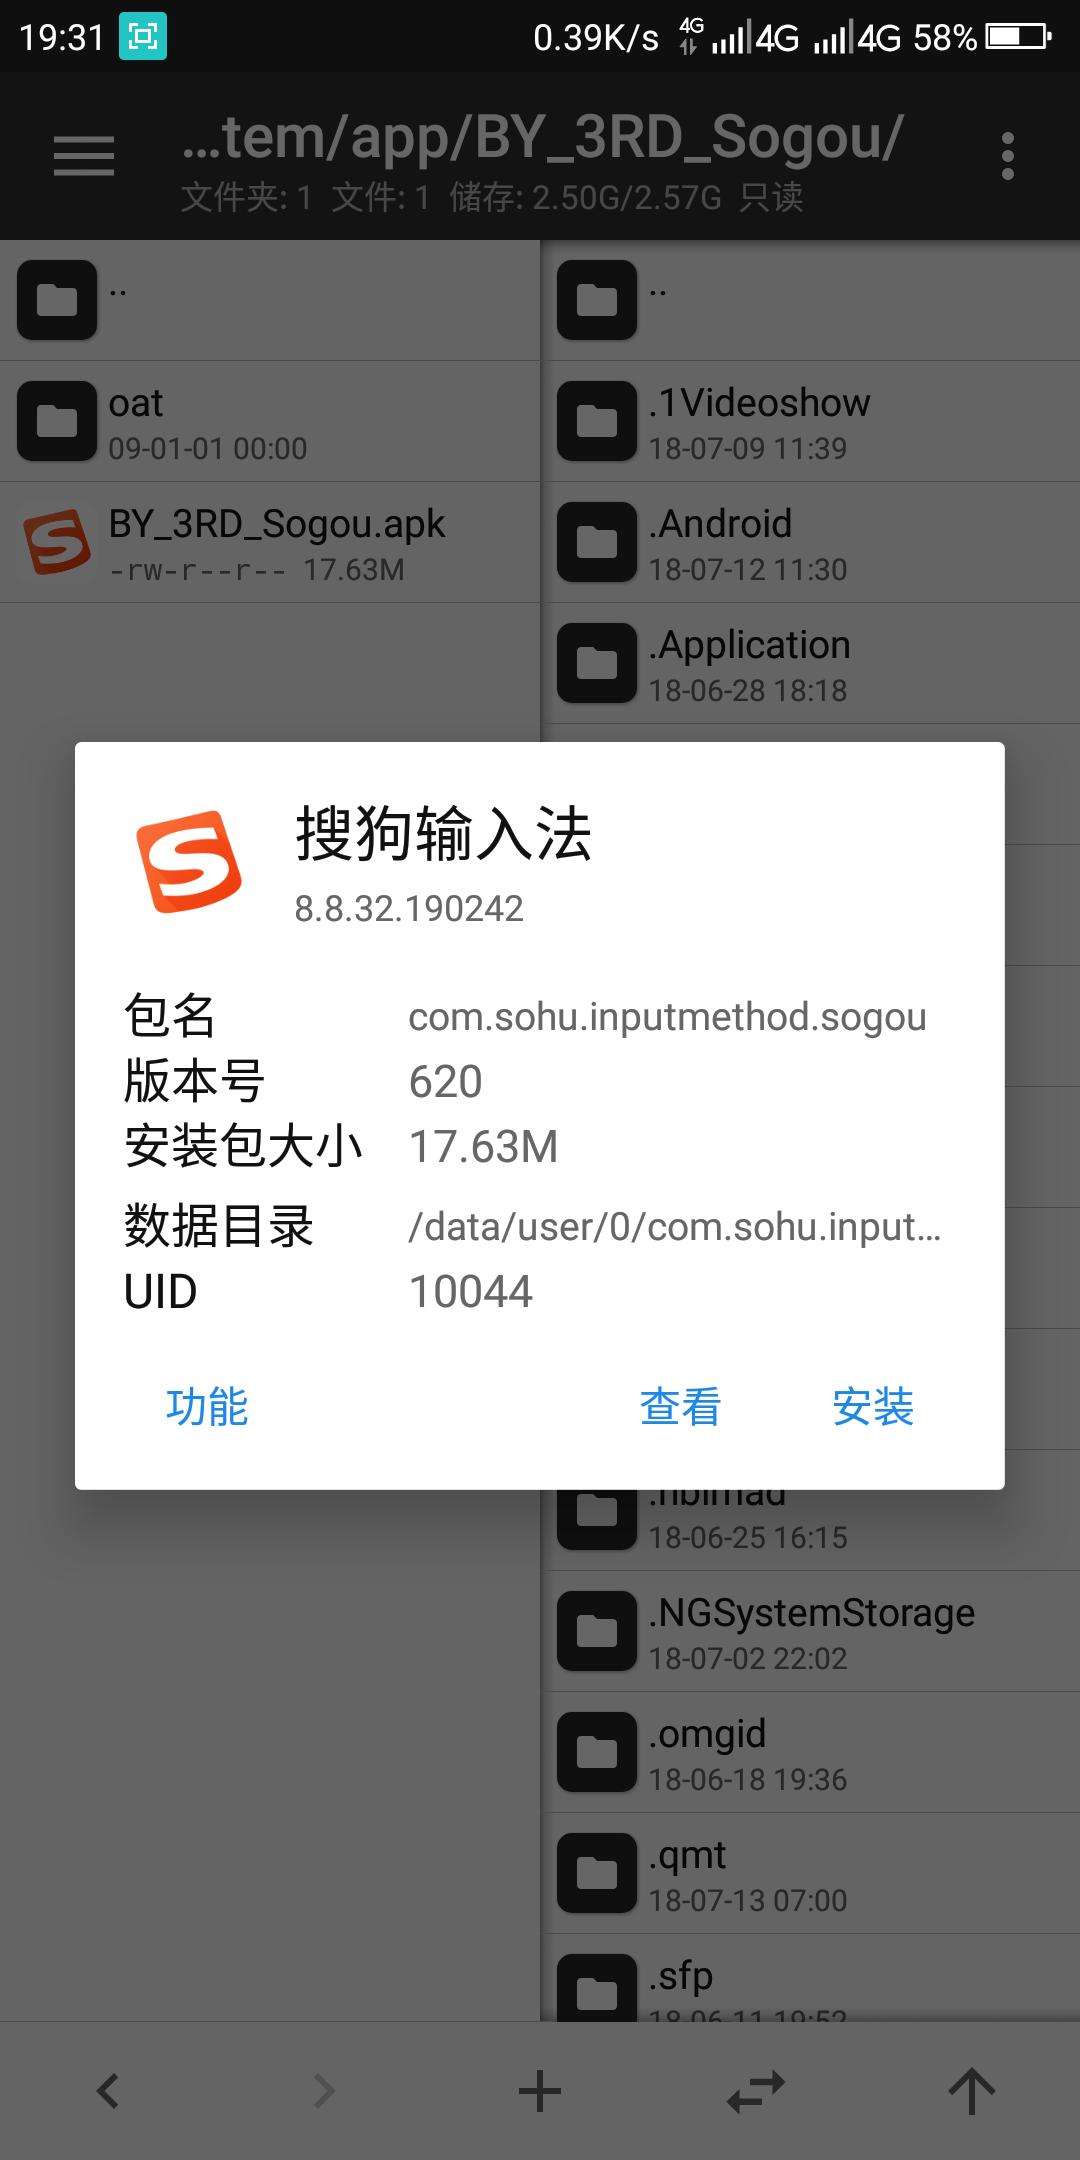 Screenshot_2018-07-14-19-32-01.png